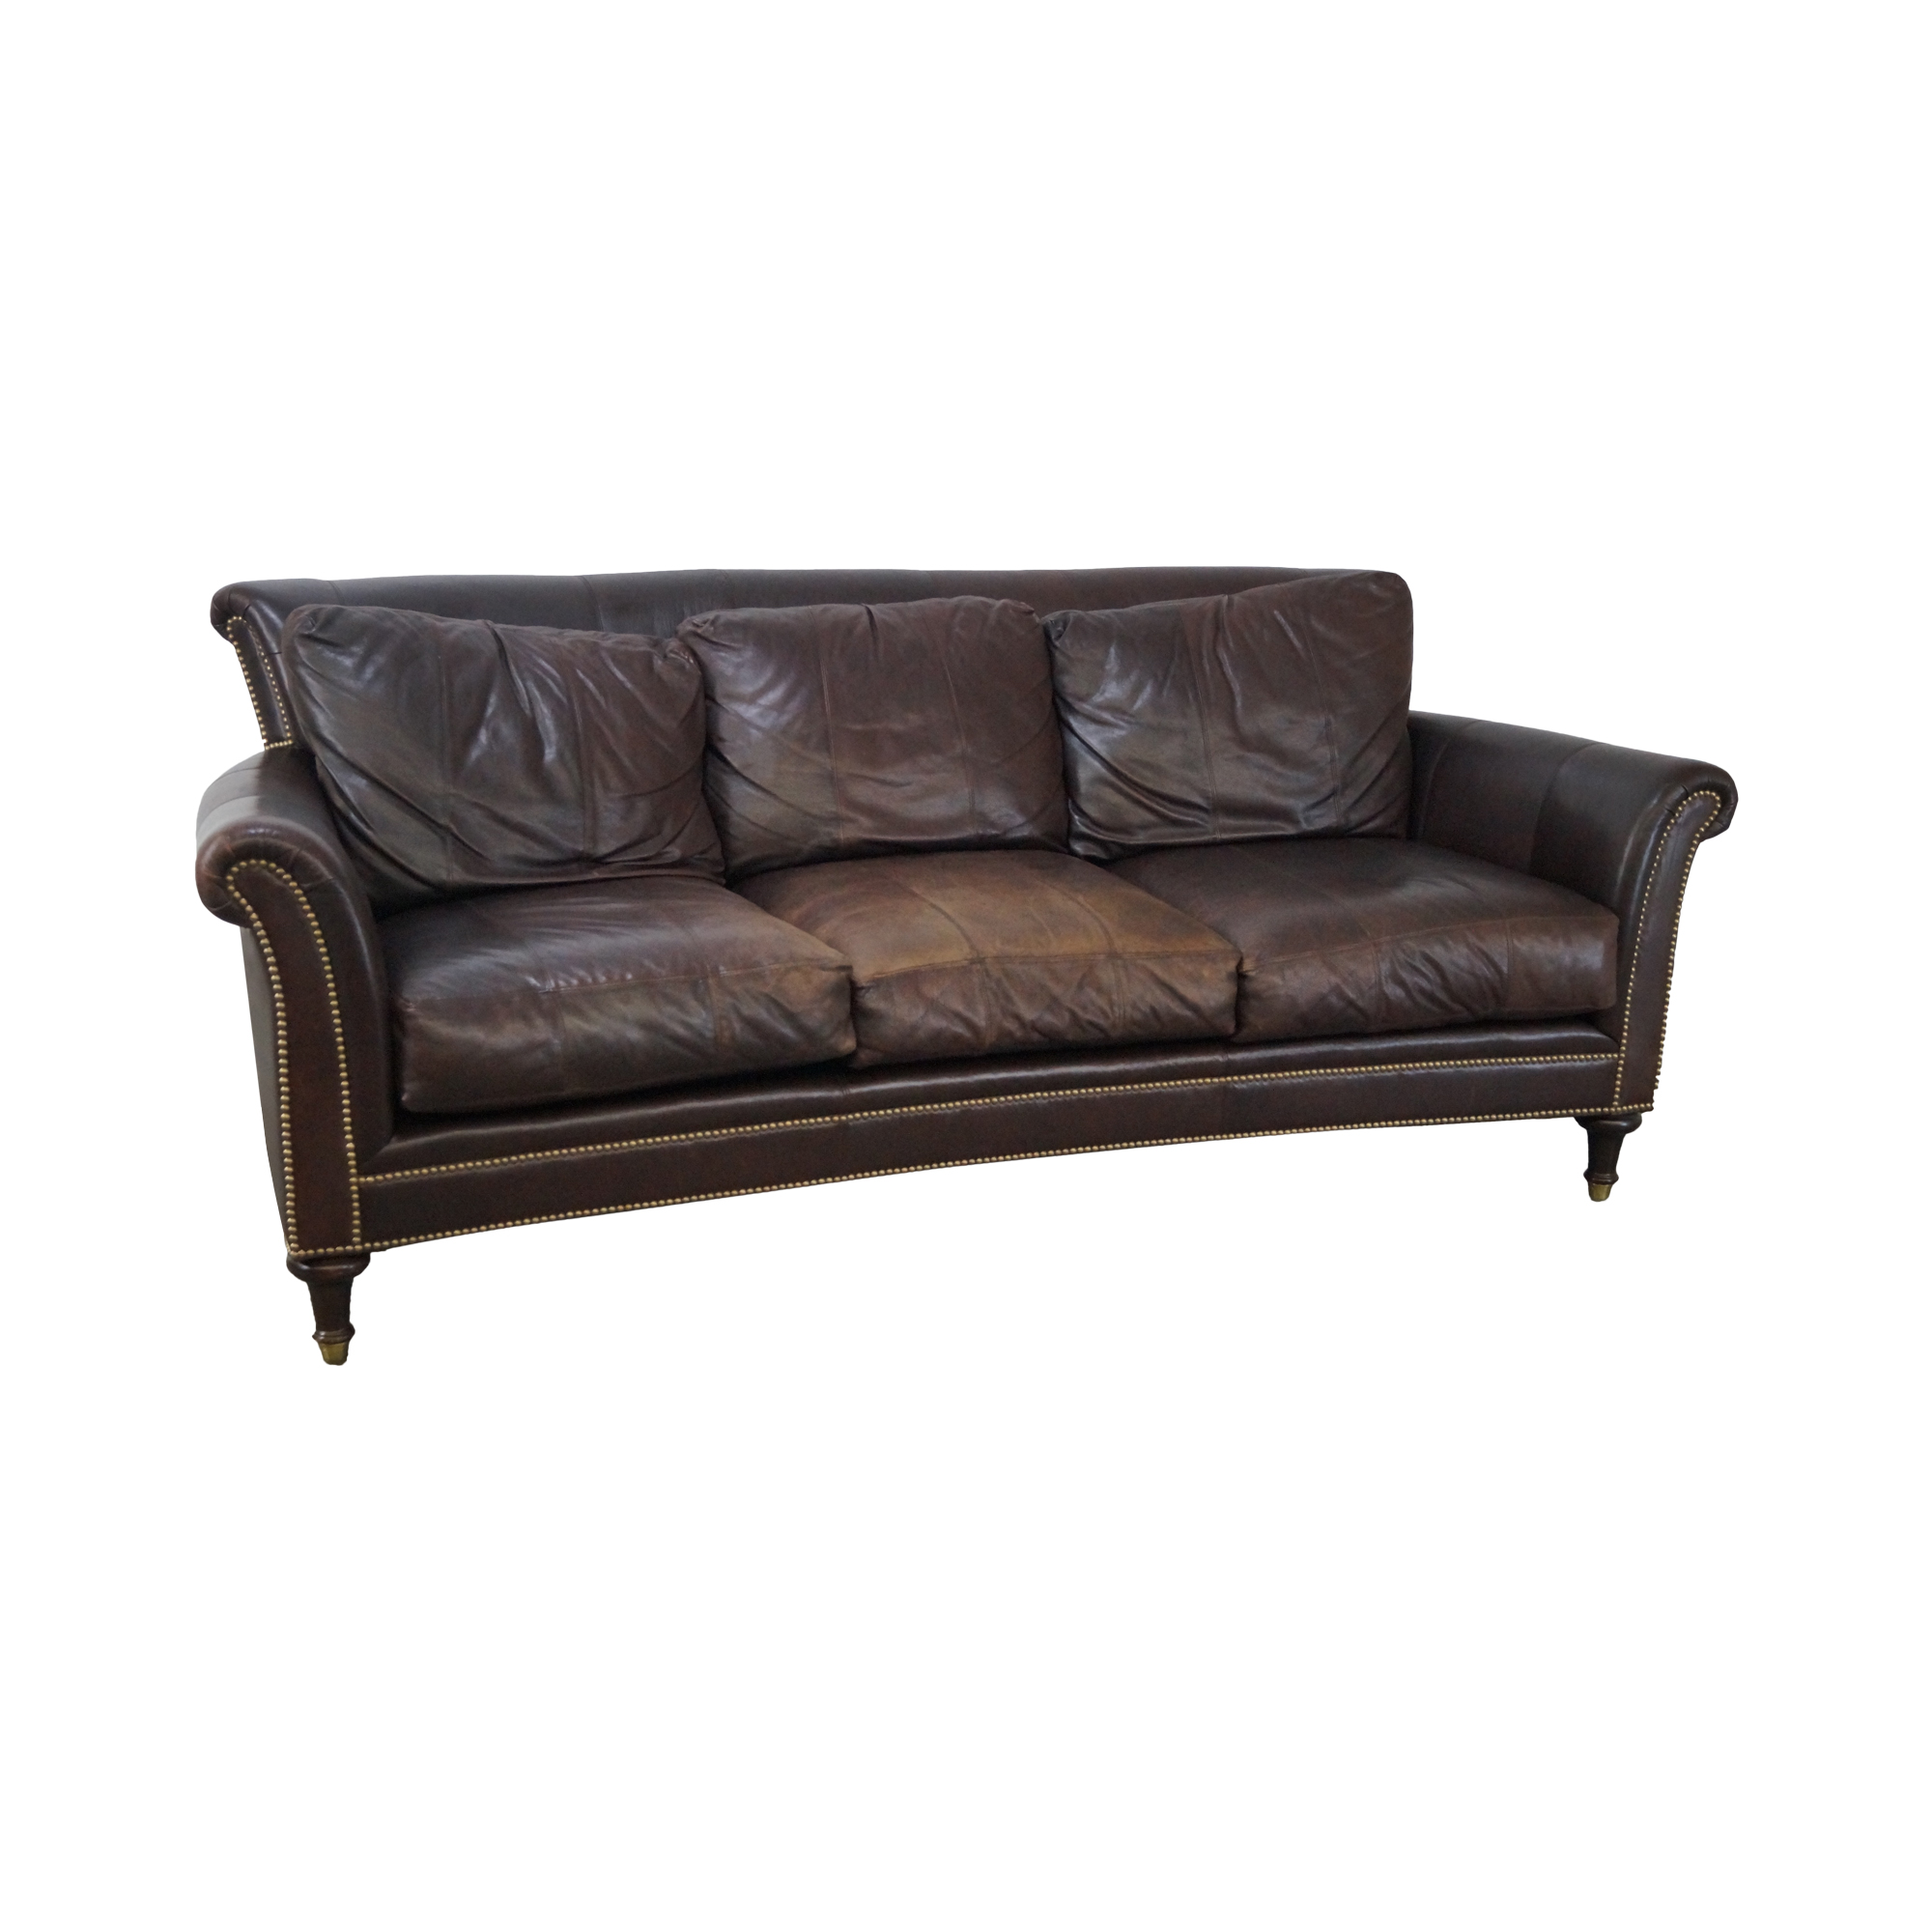 Ferguson Copeland Surrey Brown Leather Sofa